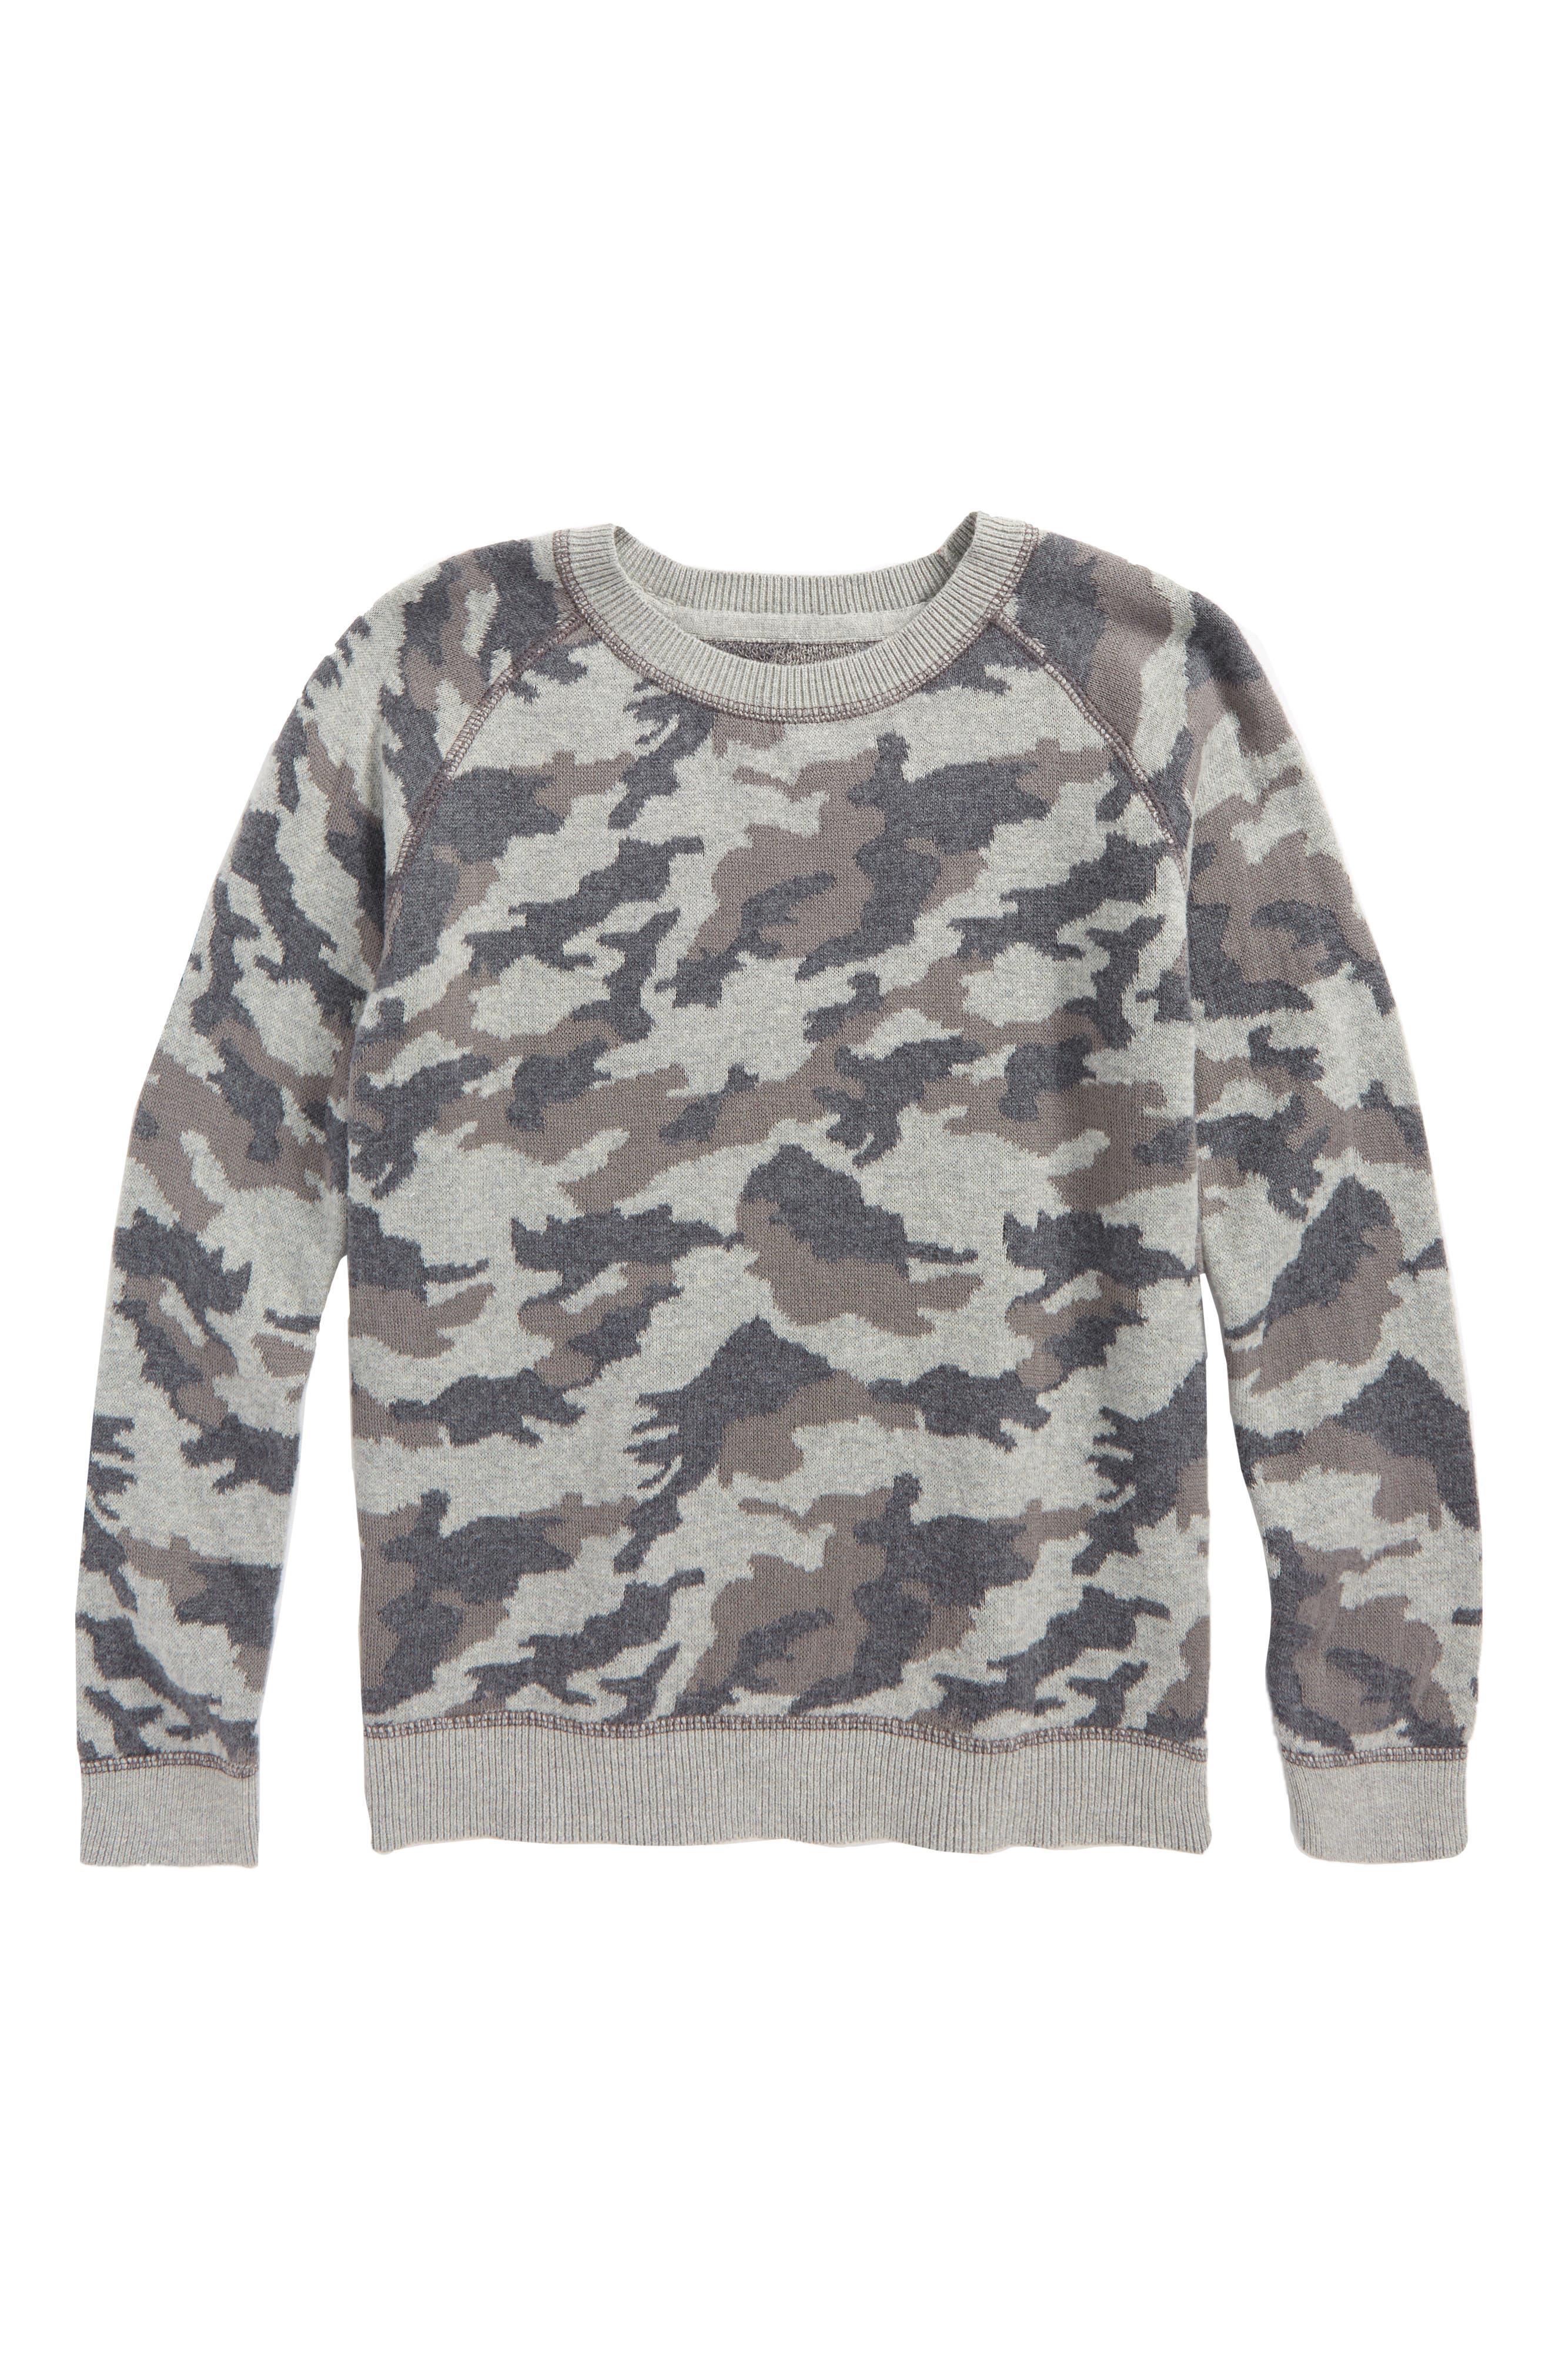 Alternate Image 1 Selected - Tucker + Tate Camo Print Sweater (Toddler Boys & Little Boys)